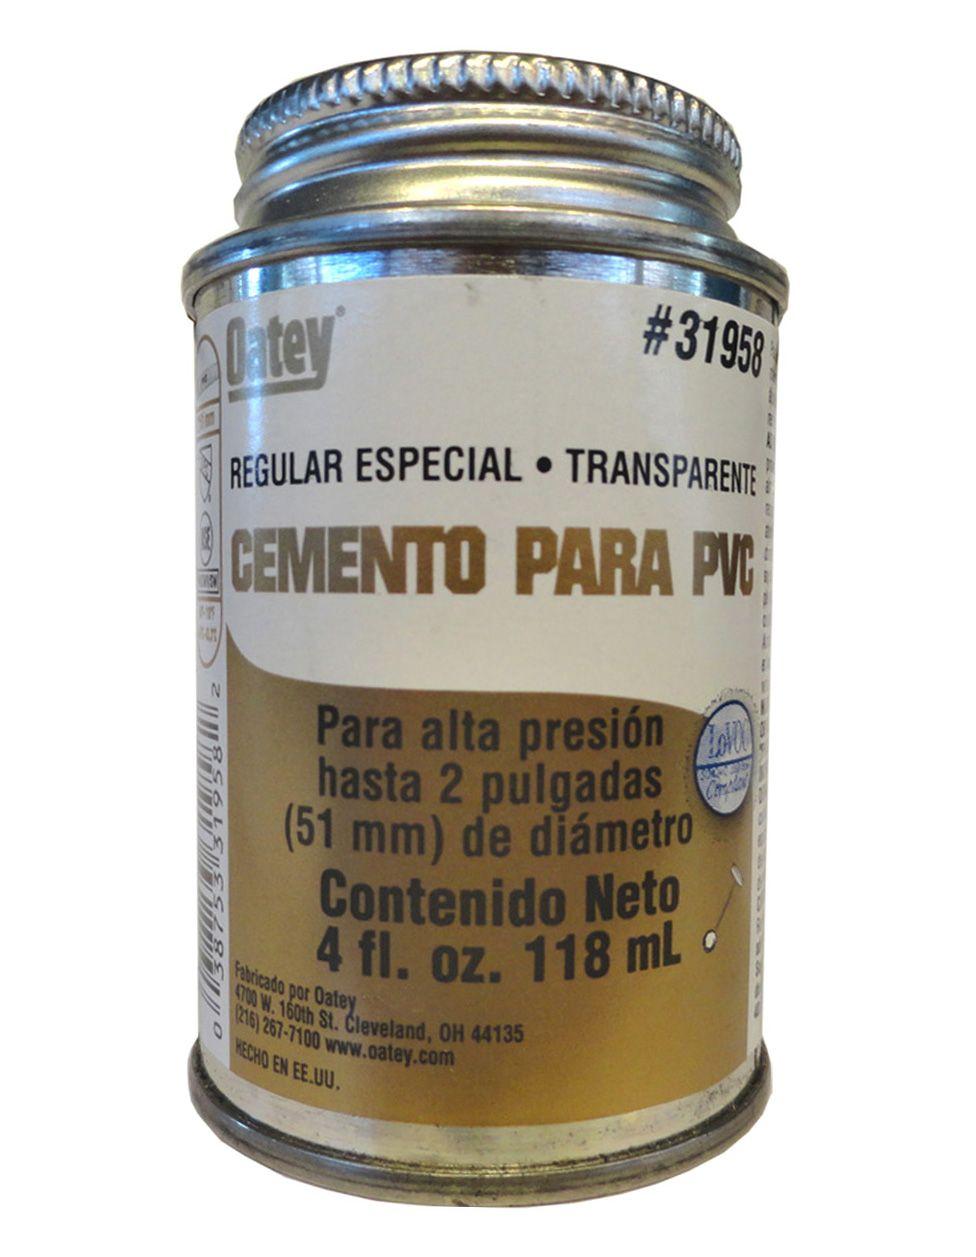 Pegamento oatey regular dorado 118 ml para tuber as de - Productos para desatascar tuberias ...